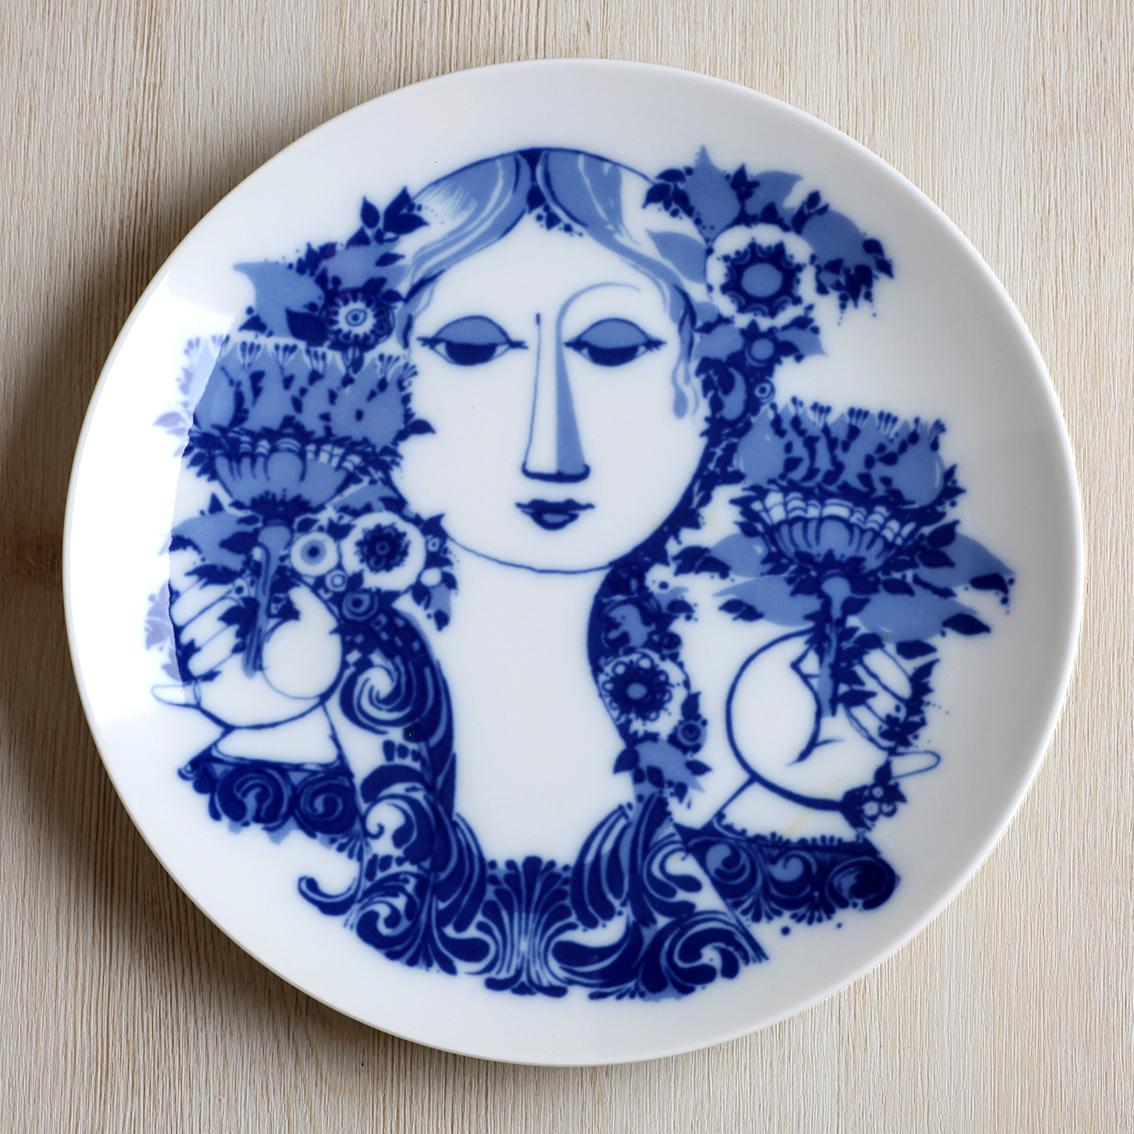 Rosenthal ローゼンタール ビヨン ヴィンブラッド 「花を持つ女性」絵皿 ヴィンテージ